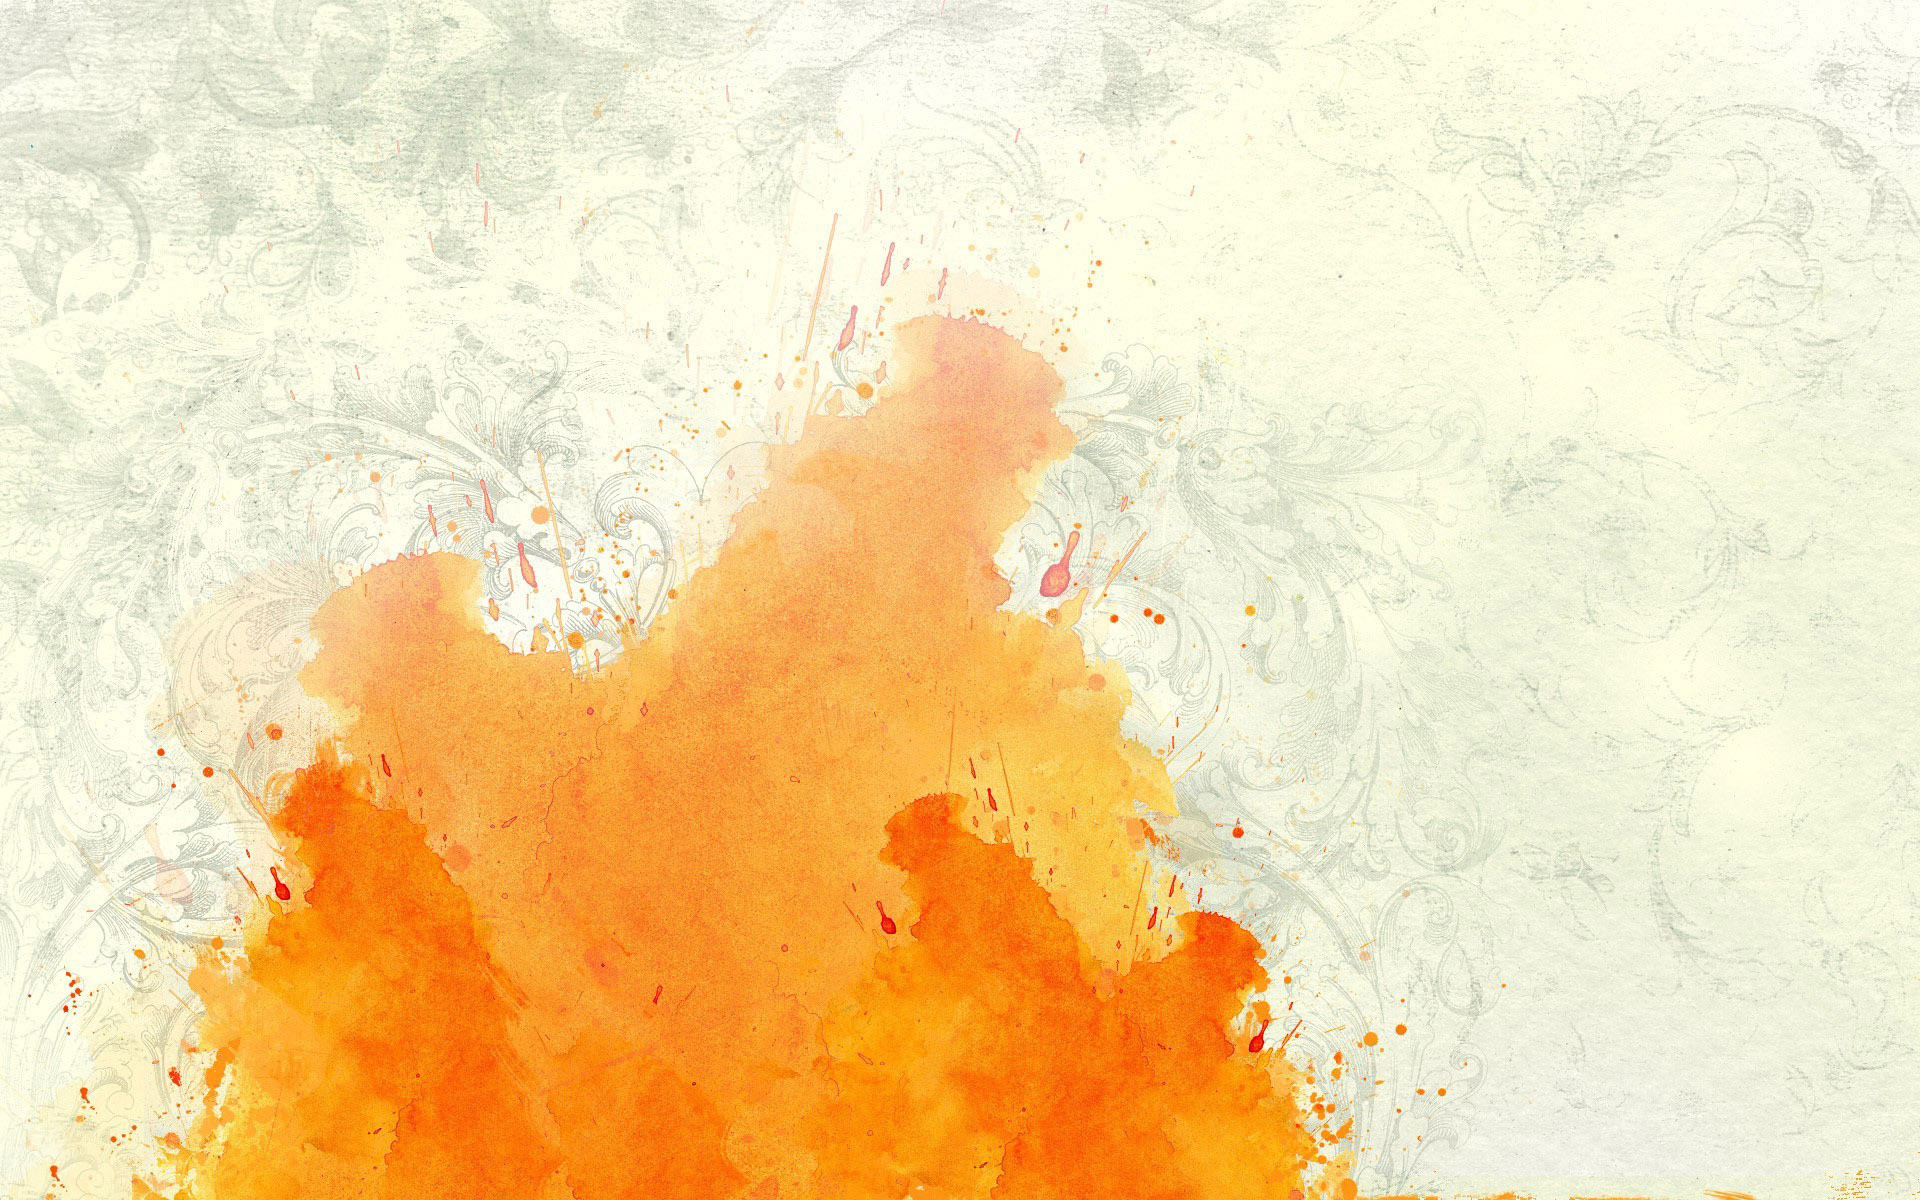 Color Splash Wallpaper HD (77+ Images